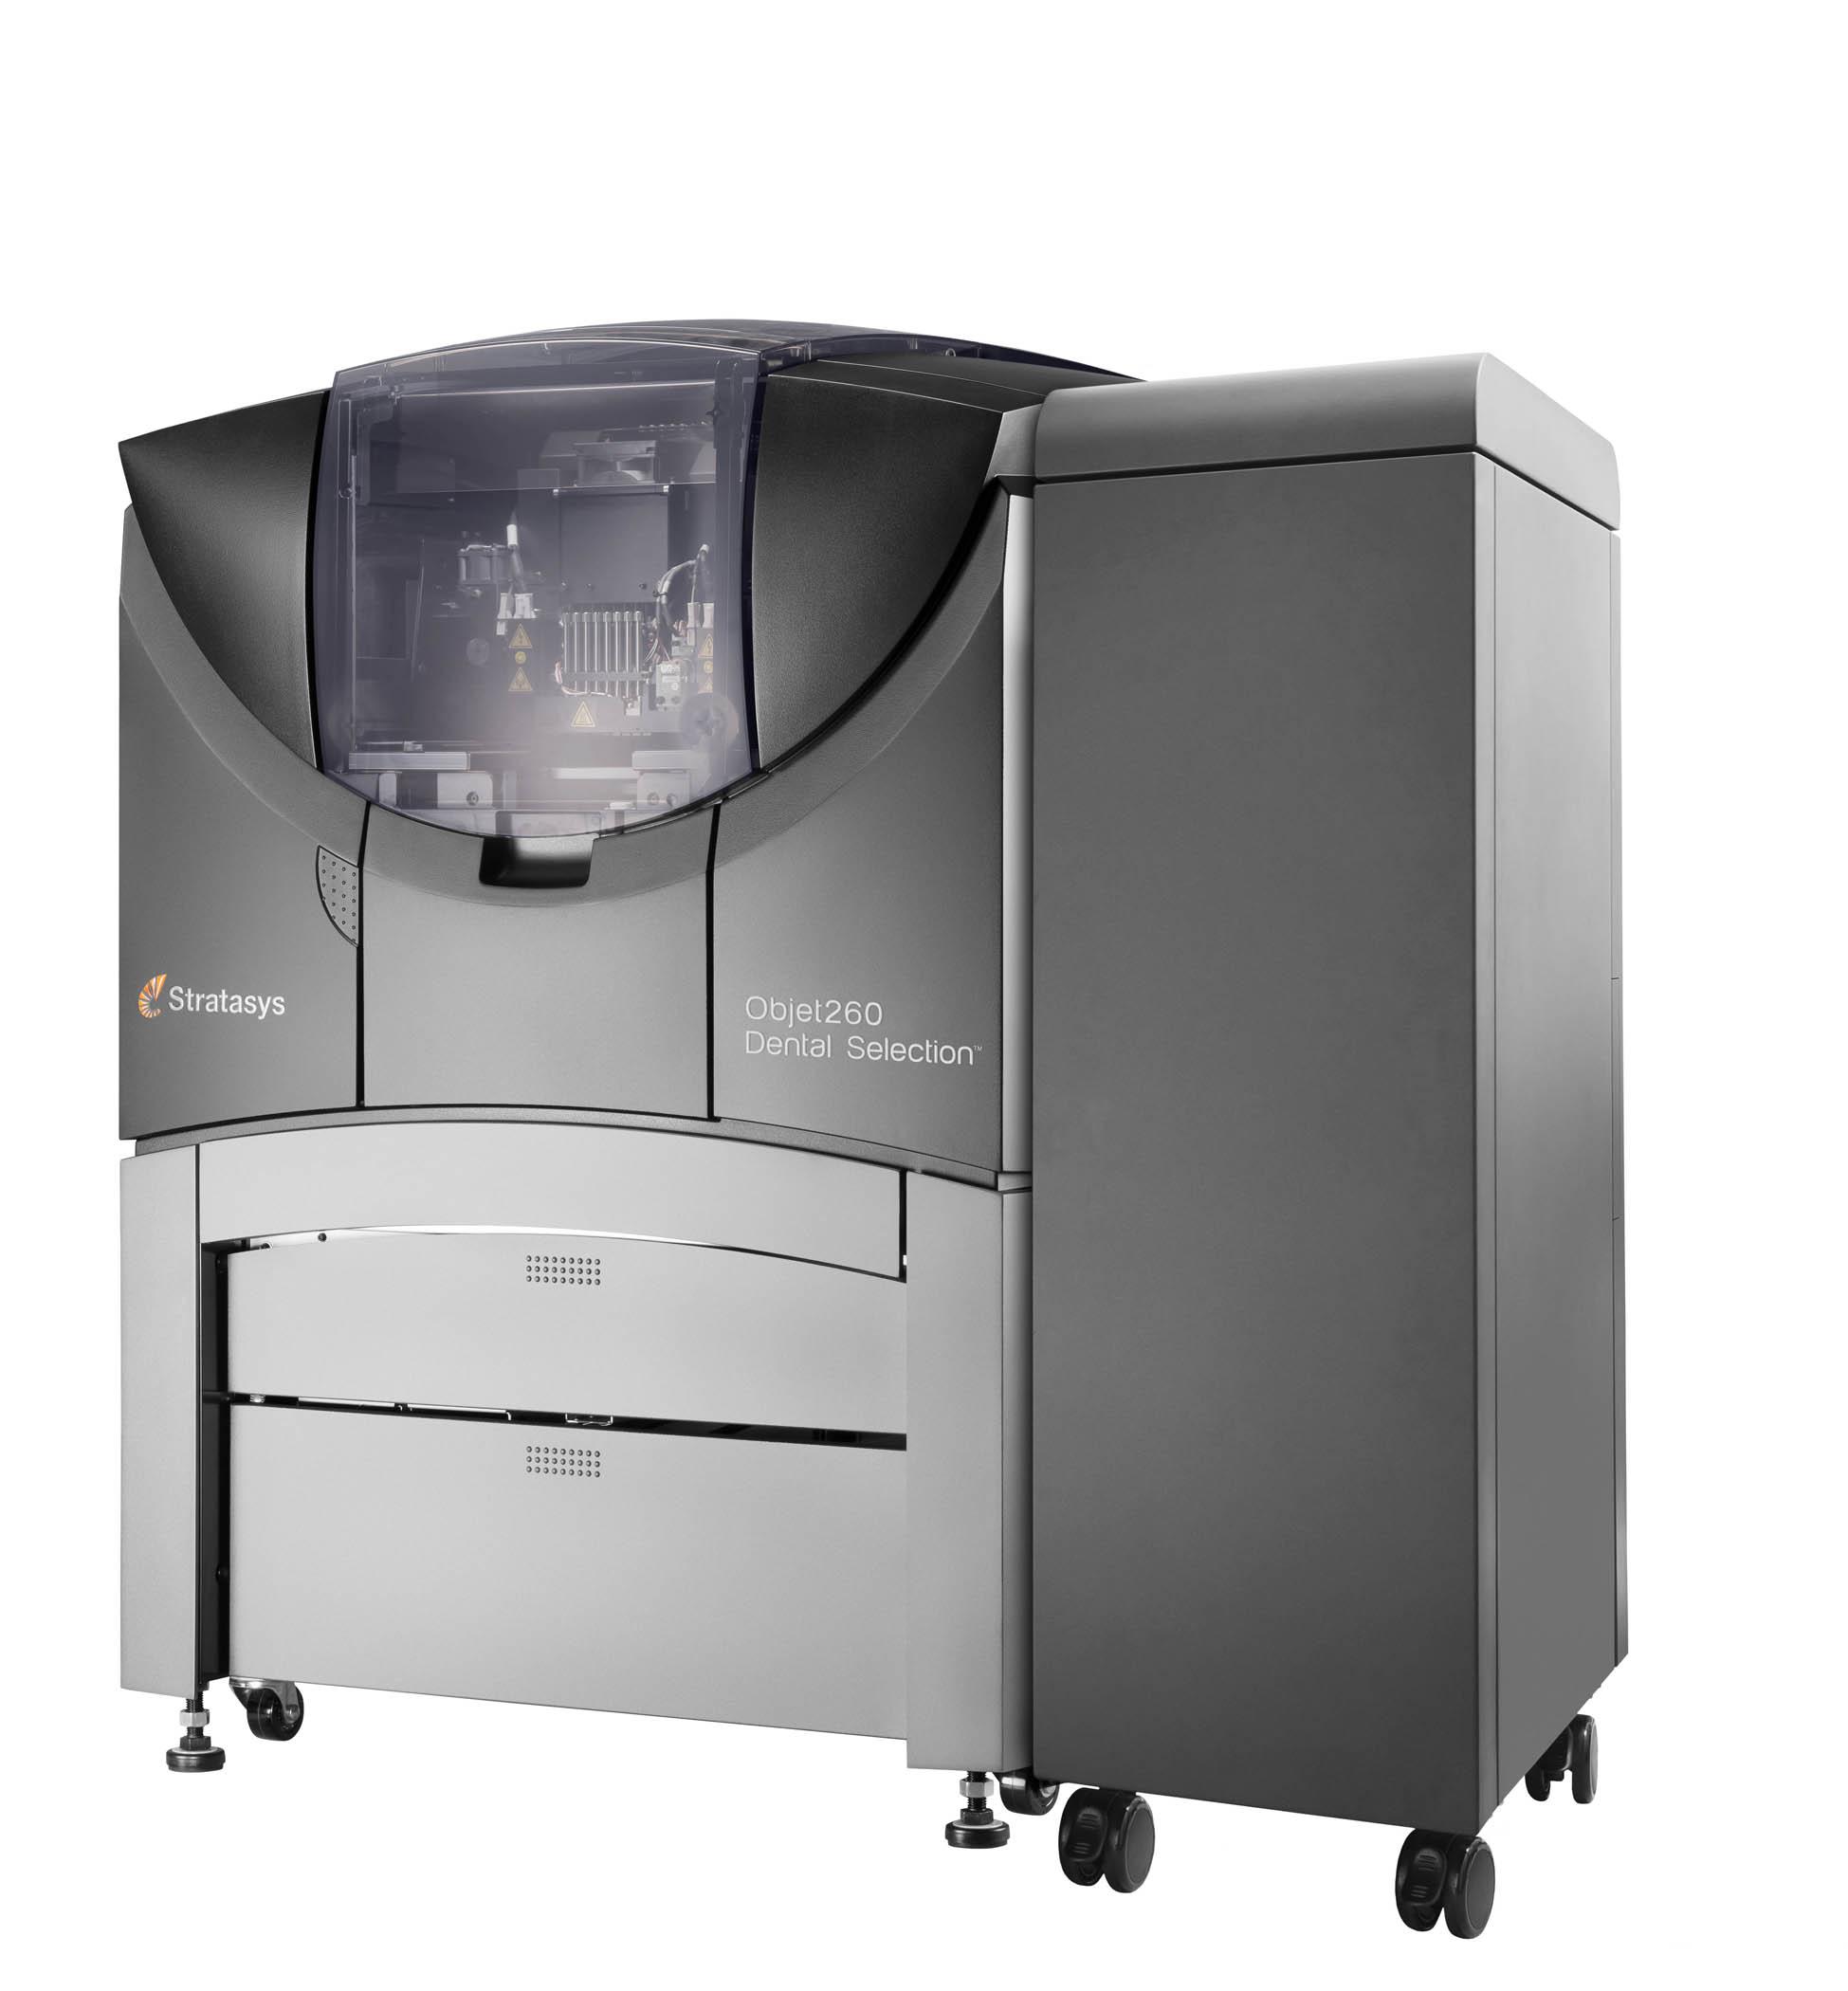 Objet260 dental 3d printing 3d druck - Stratasys stellt Objet260 Dental Selection für Digitale Zahnmedizin vor